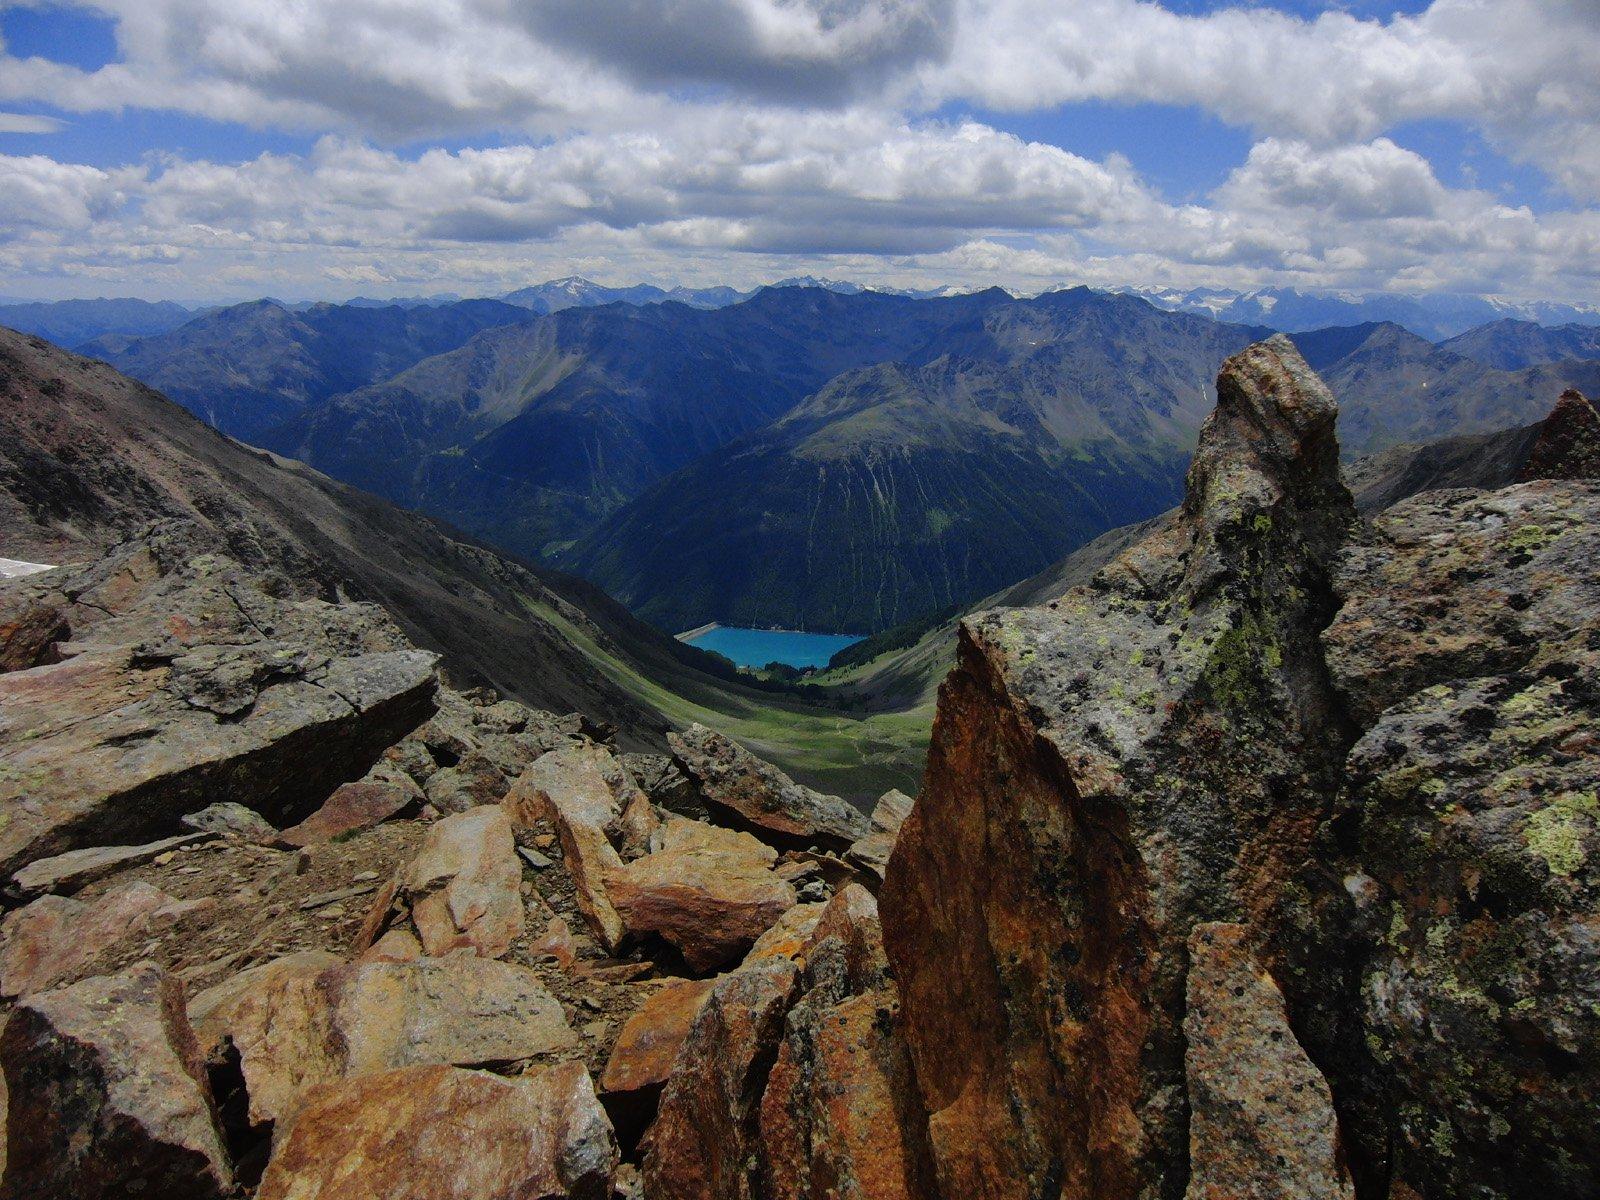 Finale (Punta di) o Finailspitze da Vernago per Giogo di Tisa e cresta NE 2017-07-15